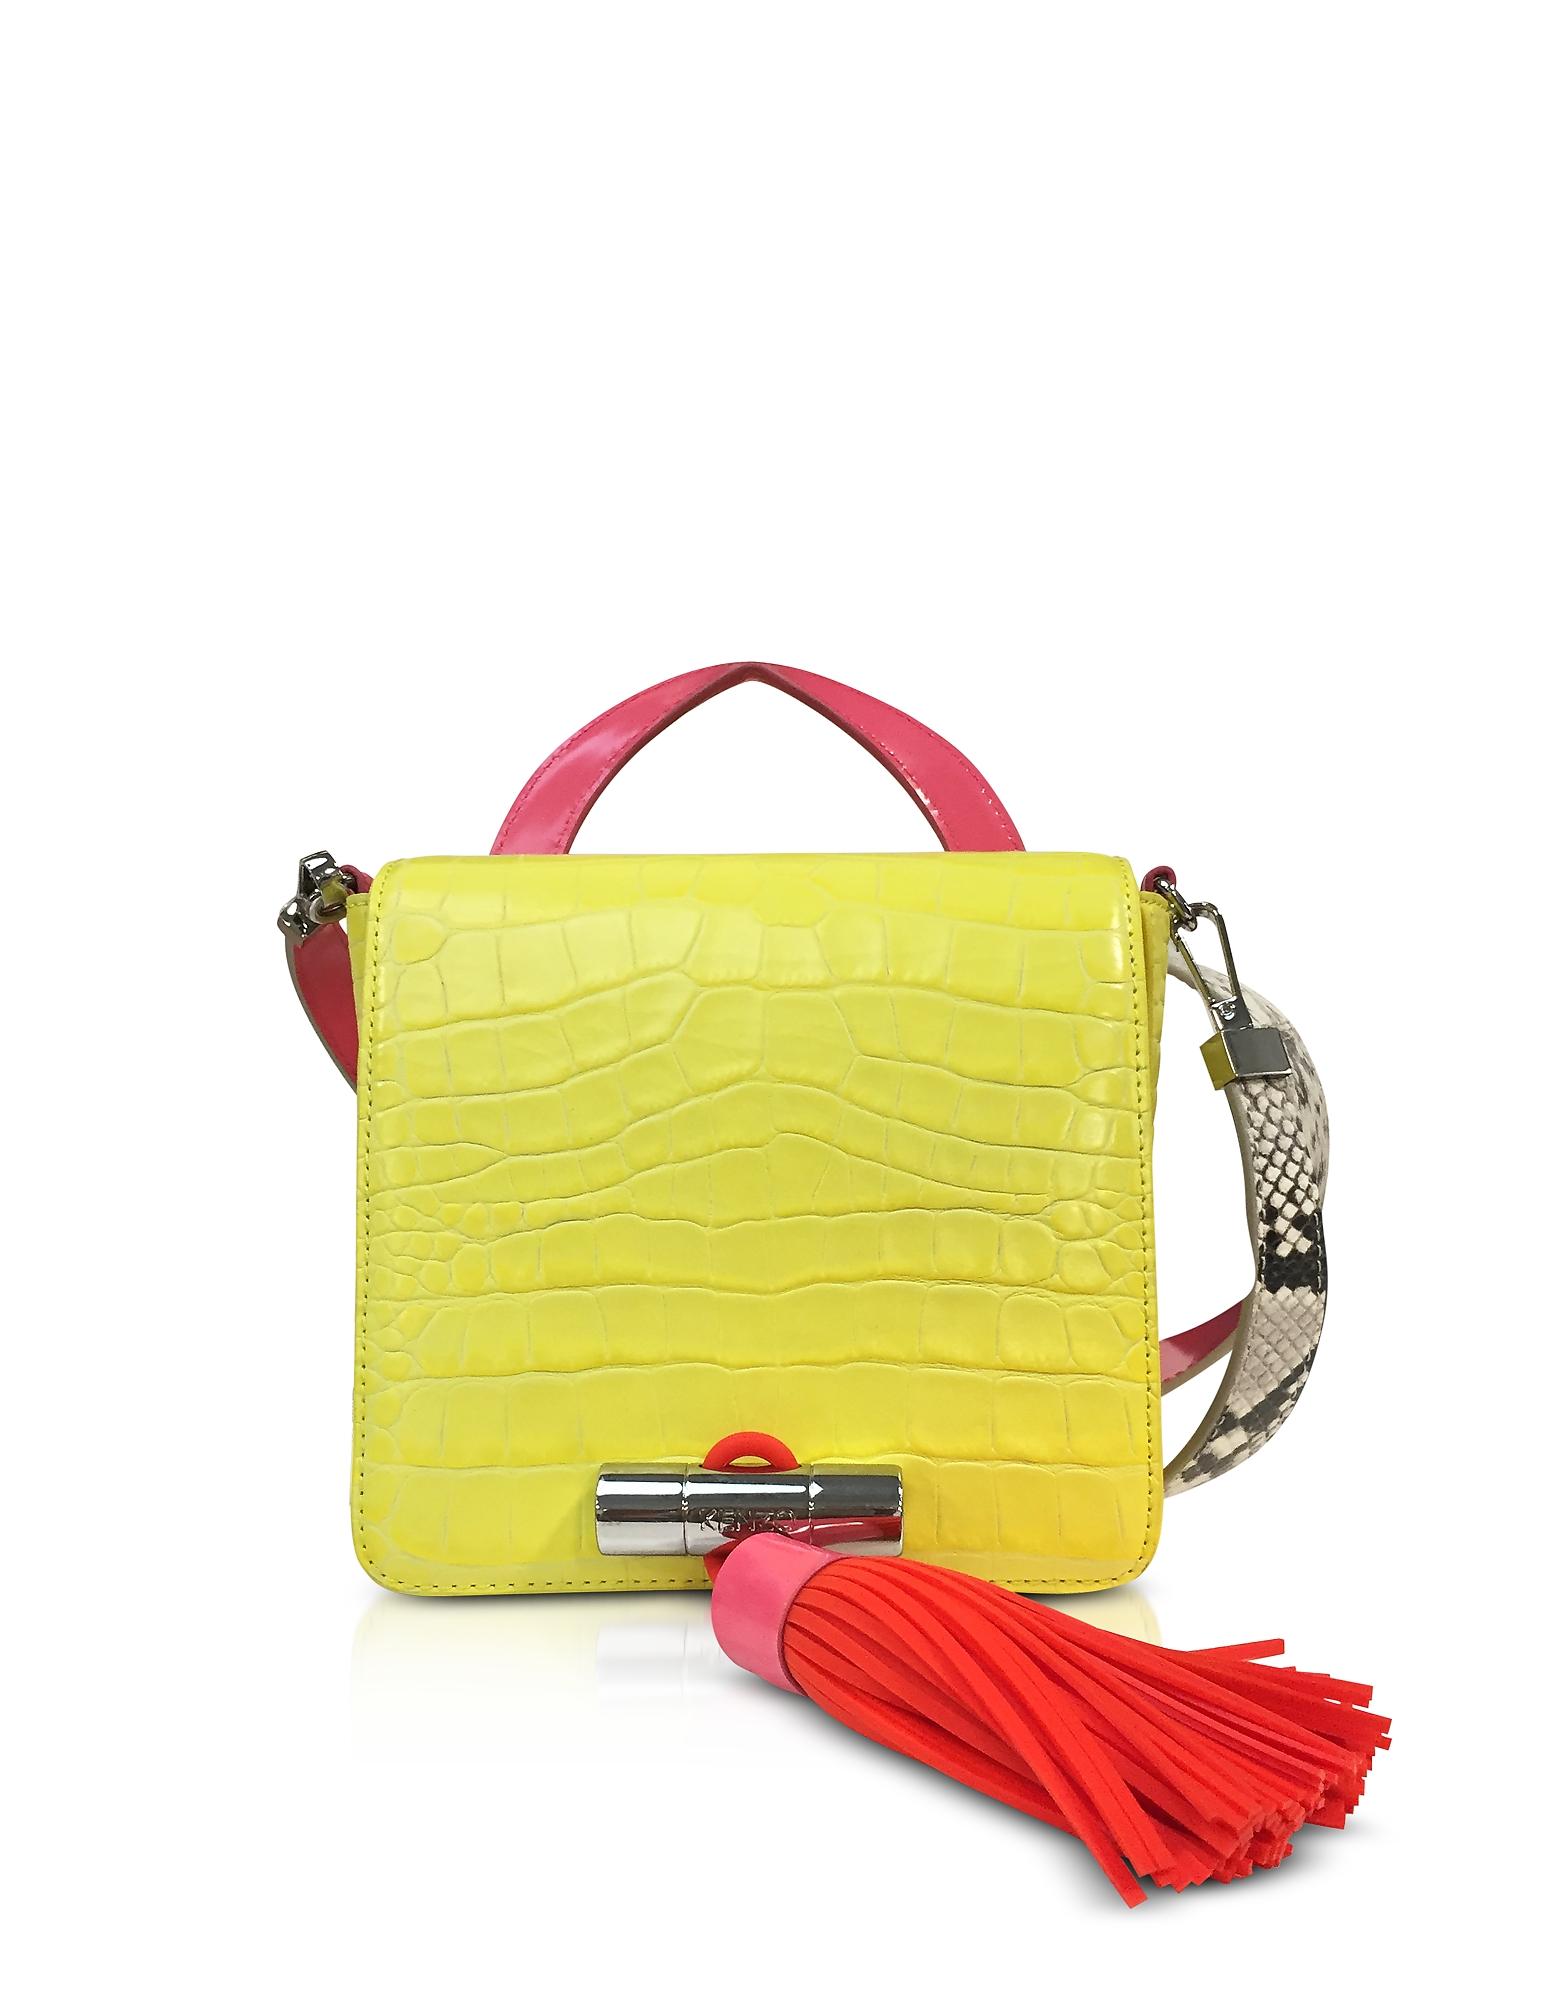 Kenzo Handbags, Lemon Croco Embossed Leather Mini Sailor Bag w/Fuchsia Oversized Tassel